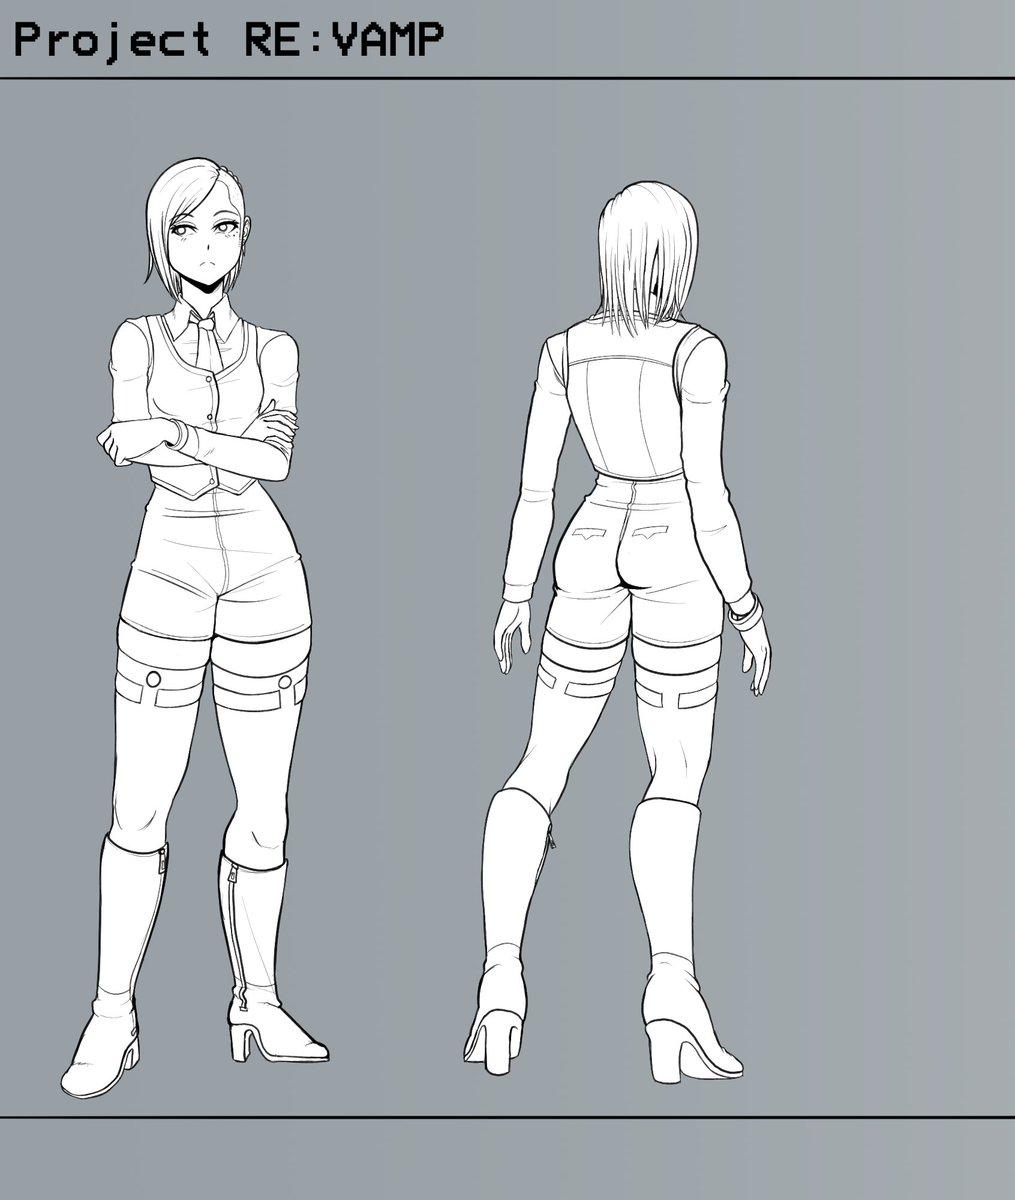 WIP, Not sure what to name her yet. She's related to Ayumi. #ProjectReVAMP Insta: VaporwaveNinja DeviantART: VaporNinja #art #digitaldrawing #painttoolsai #ArtistOnTwitter #artistoninstagram #drawing #sketch #project #webcomic #concept #cyberpunk #comic #conceptart #characterart